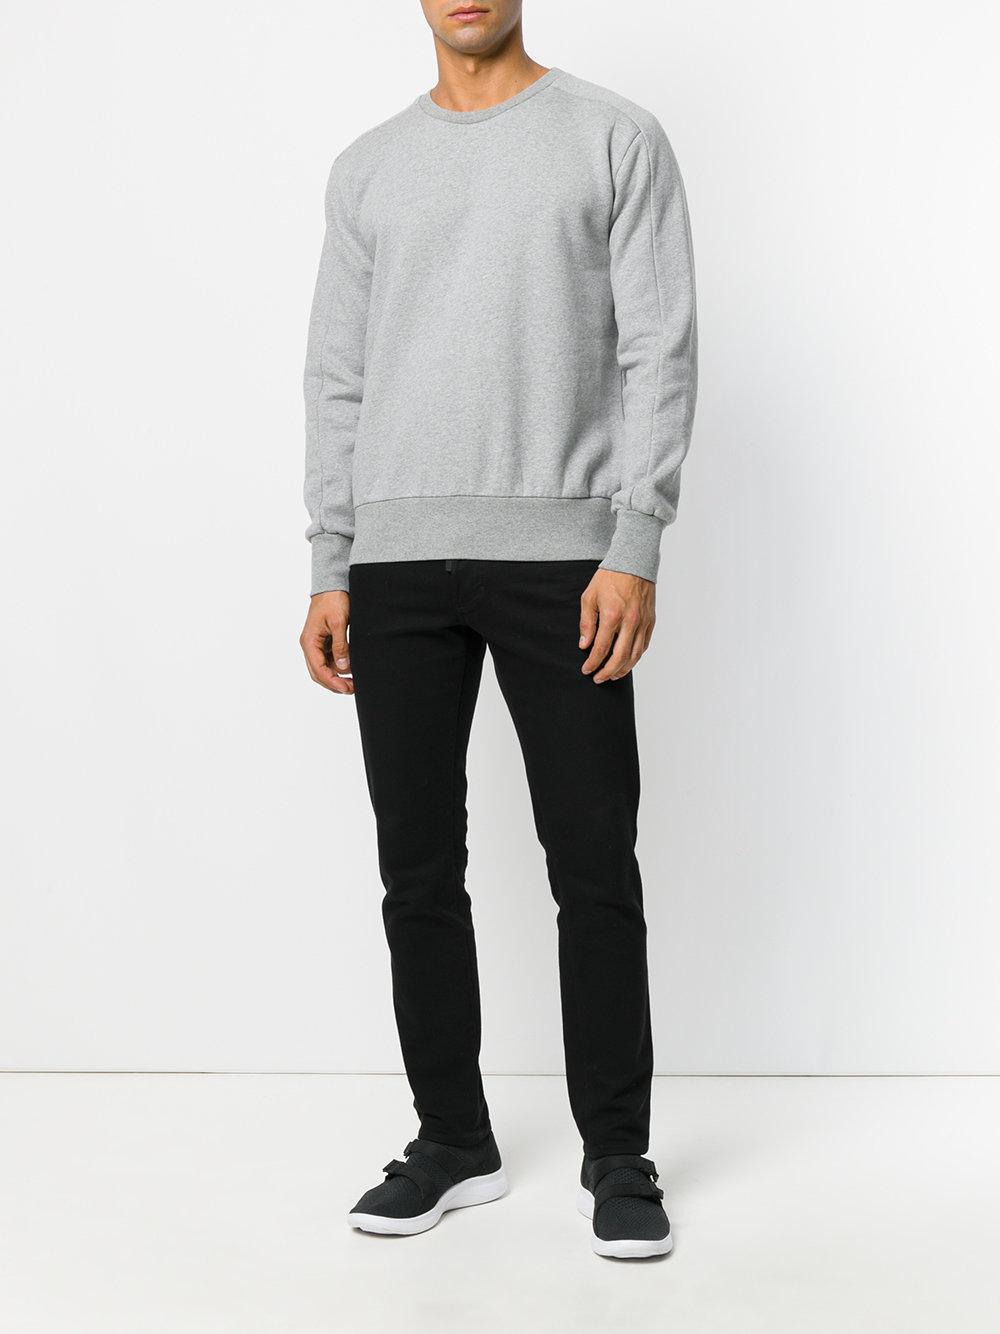 4bd75824da67 Natural Selection Linear Crewneck Sweatshirt in Gray for Men - Lyst